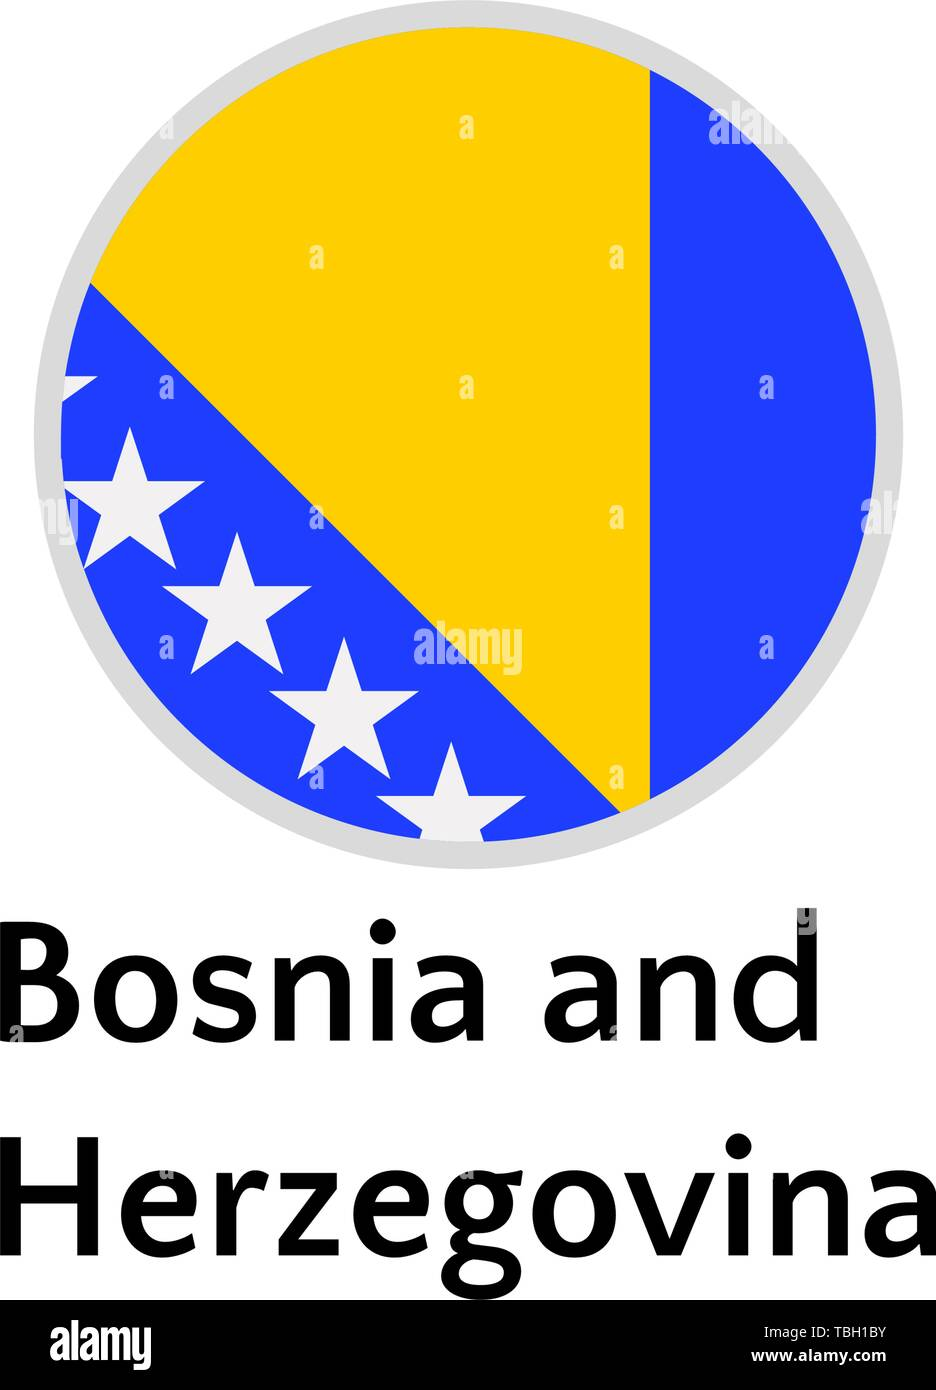 Bosnia and Herzegovina flag round flat icon, european country vector illustration - Stock Vector